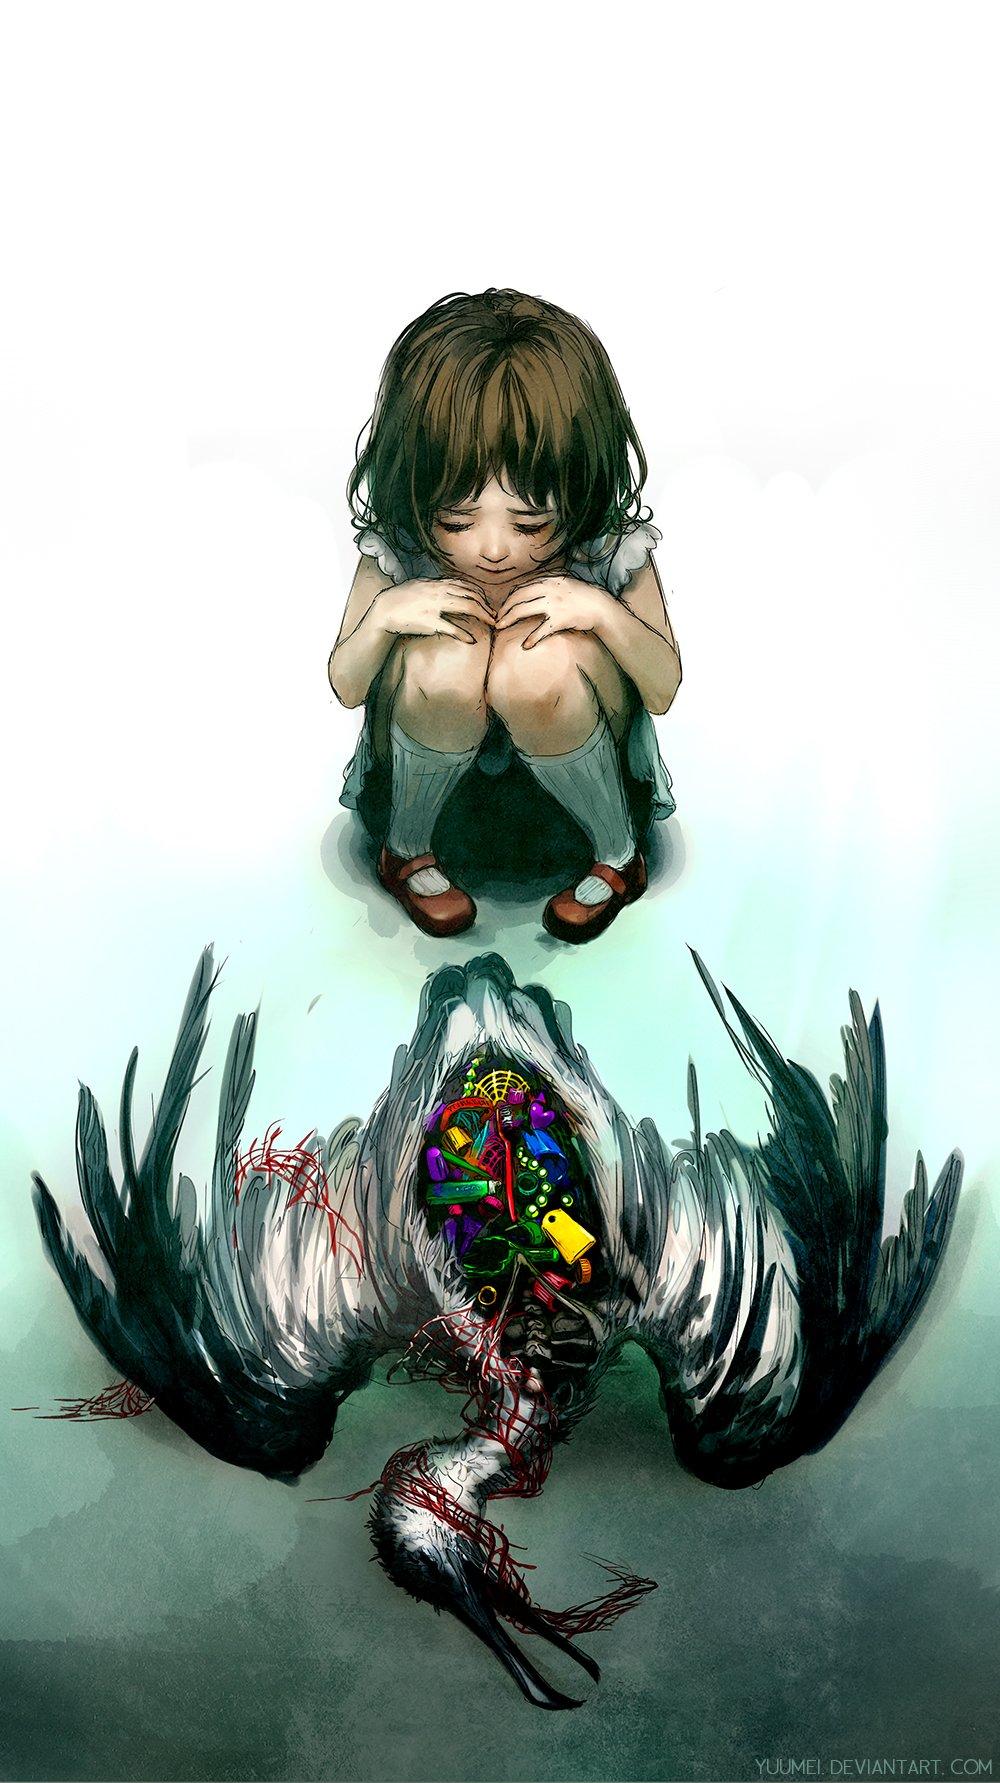 Art Yuumei и ее легкий сюрреализм - Изображение 7